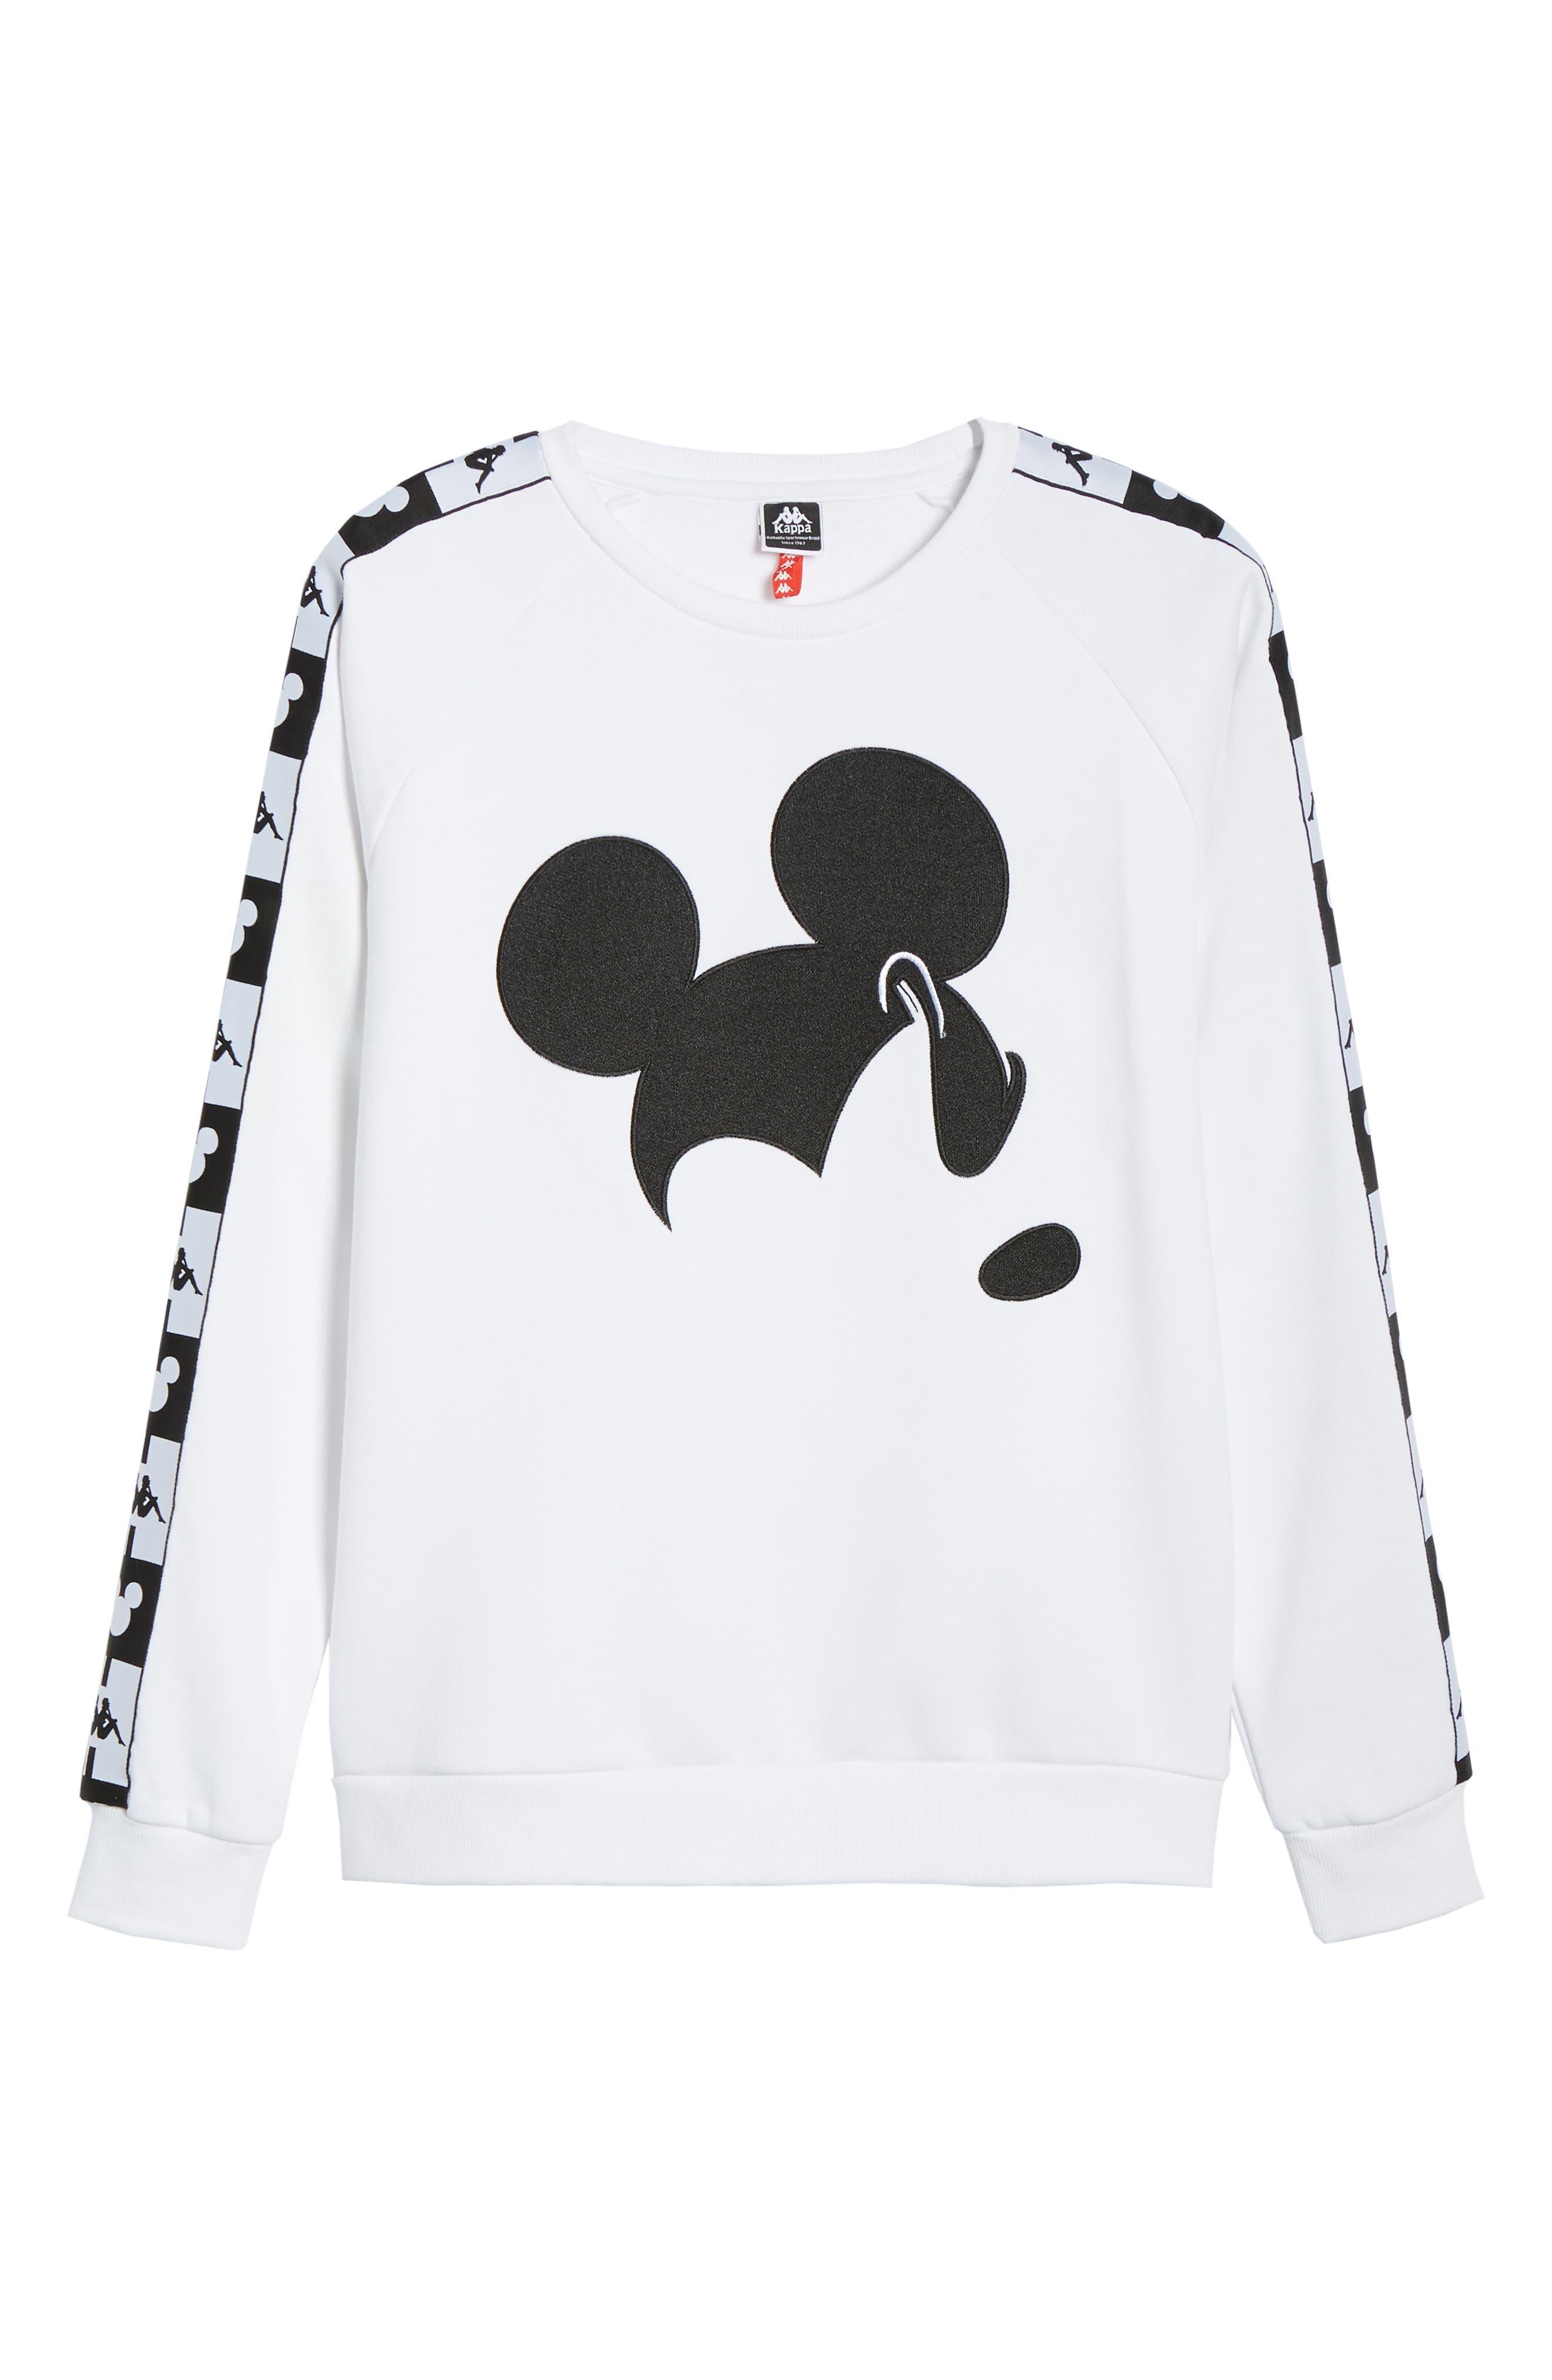 KAPPA,                             x Disney<sup>®</sup> Authentic Audley Sweatshirt,                             Alternate thumbnail 6, color,                             100